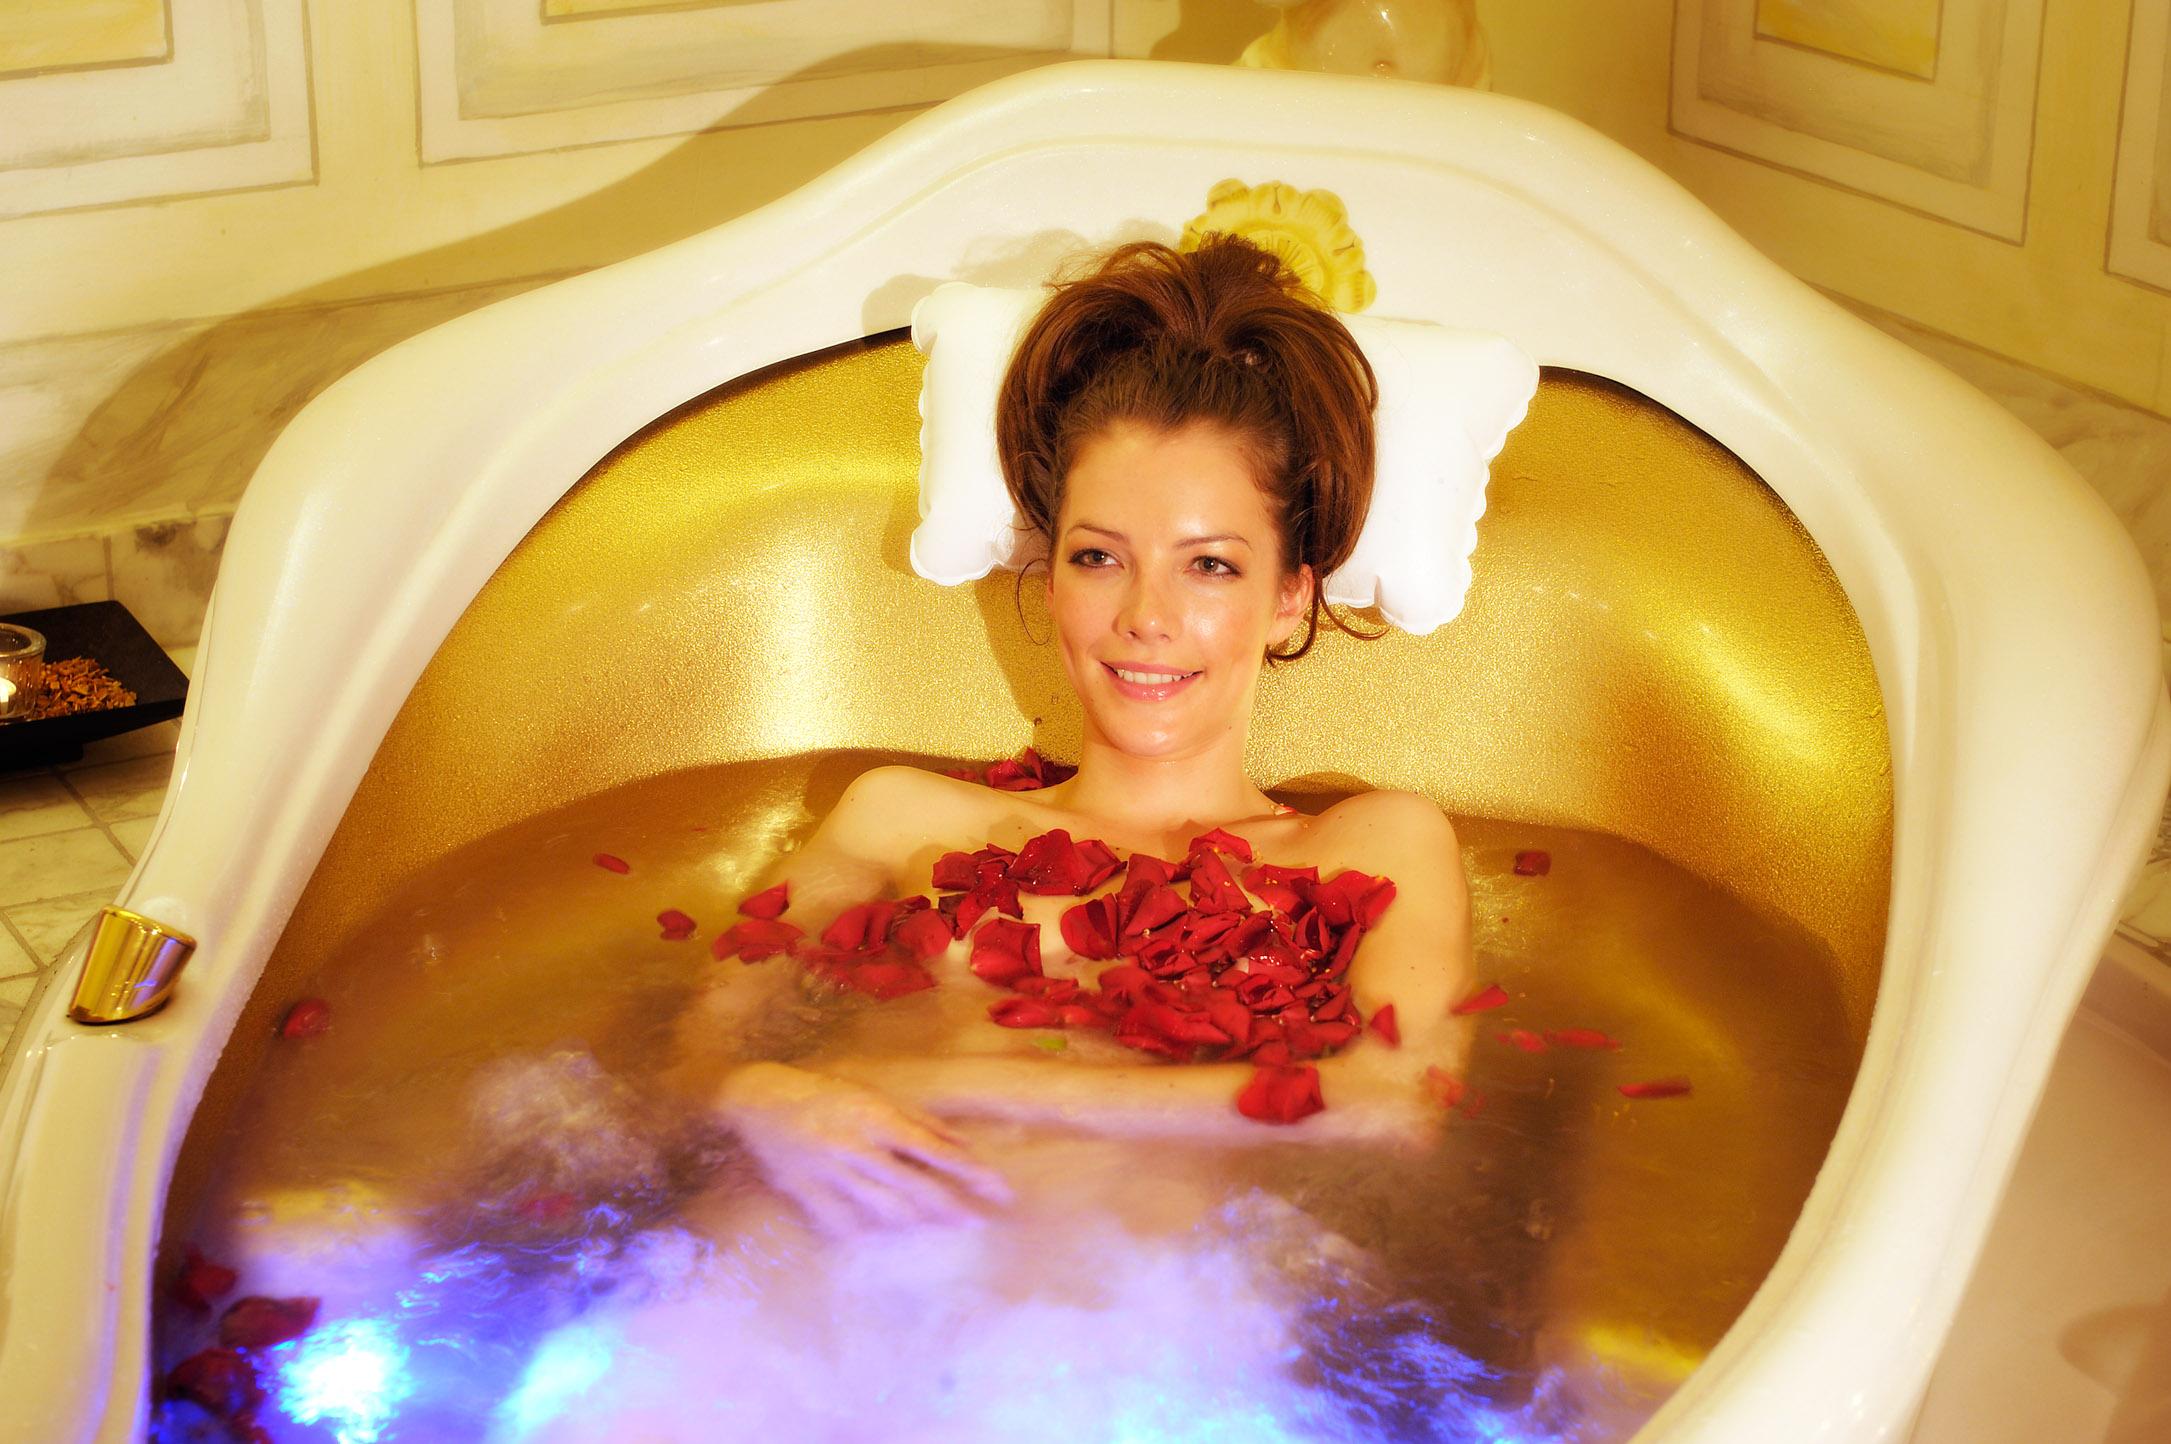 Spa baths